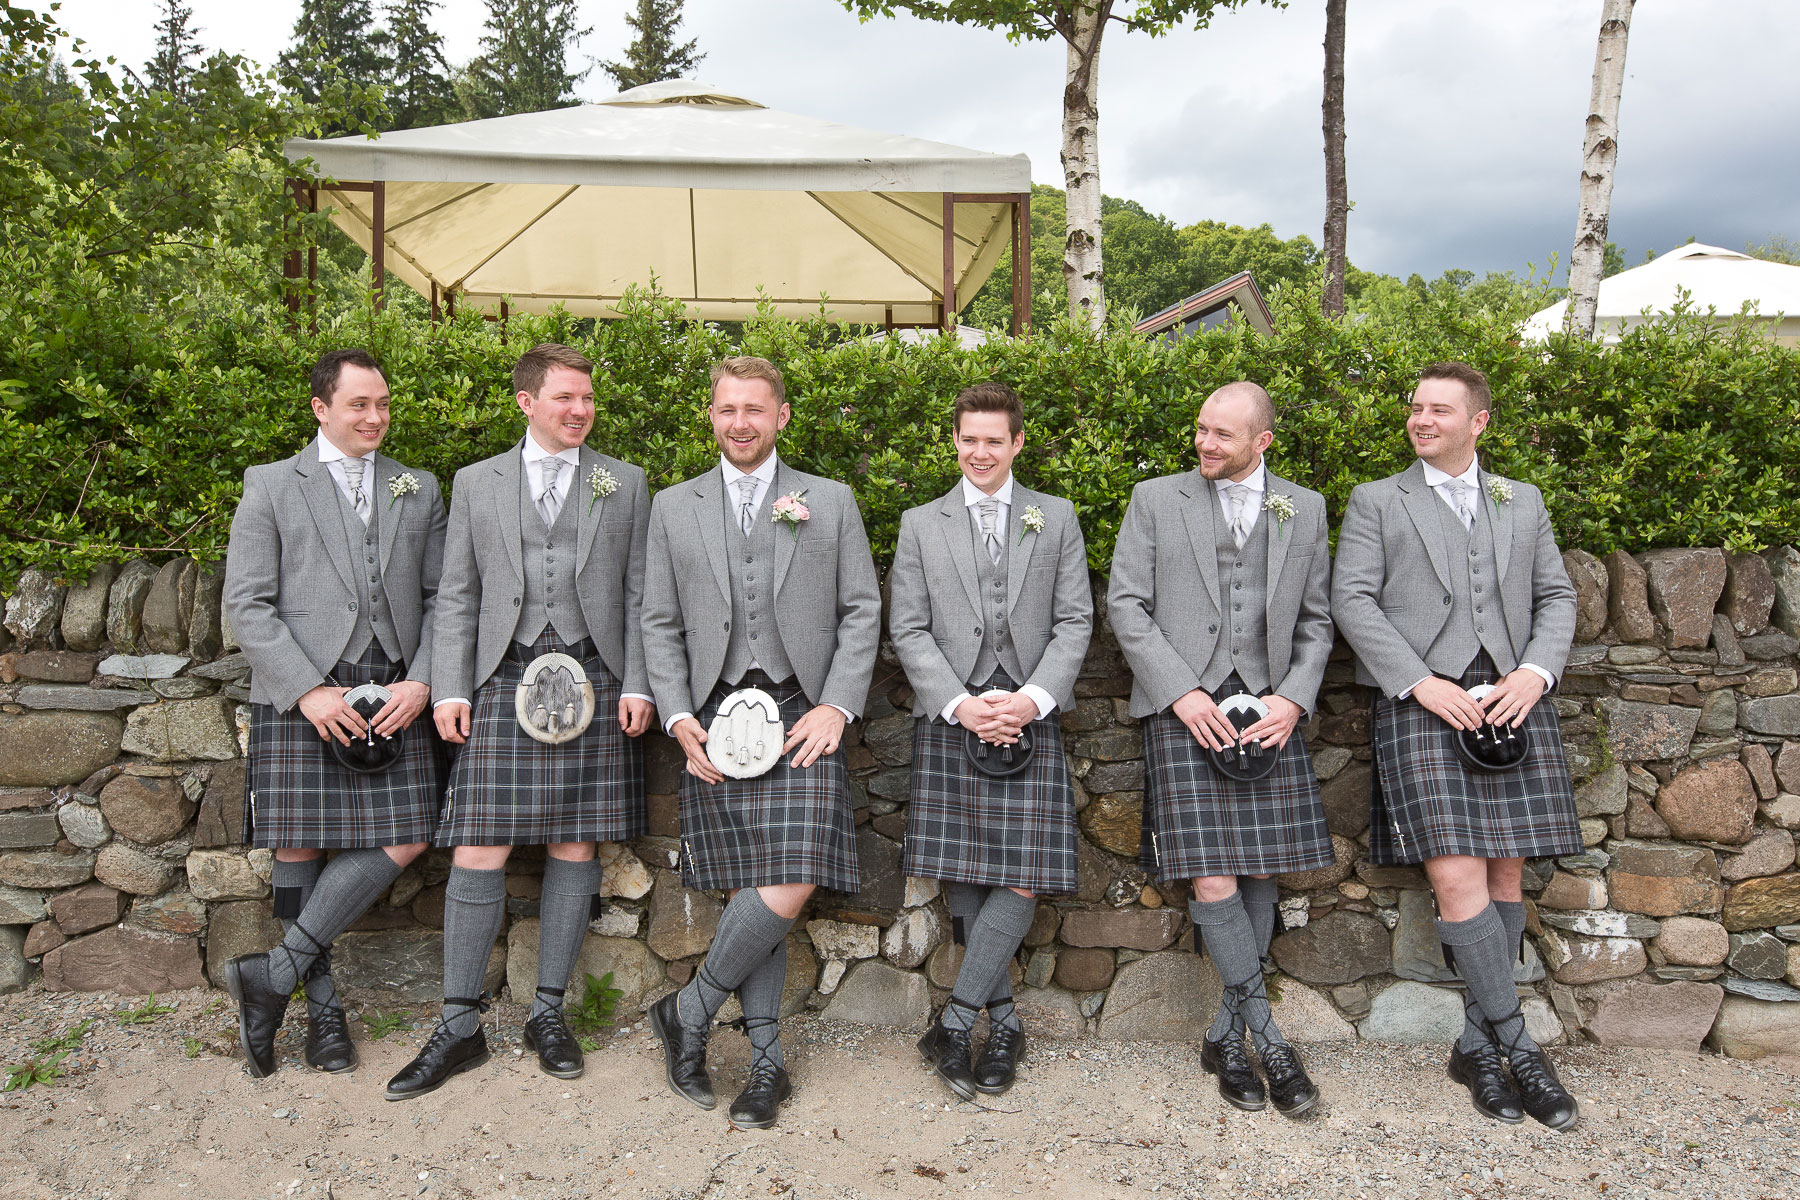 loch-lomond-groomsmen